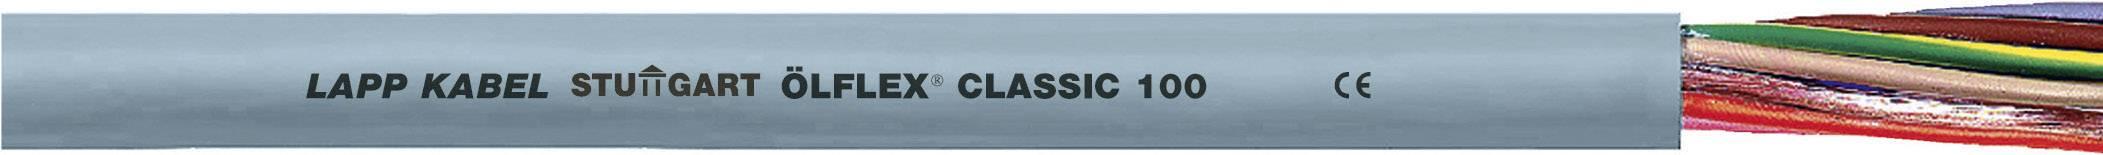 Kabel LappKabel Ölflex CLASSIC 100 2X0,5 (00100004), PVC, 4,8 mm, 500 V, šedá, 1000 m